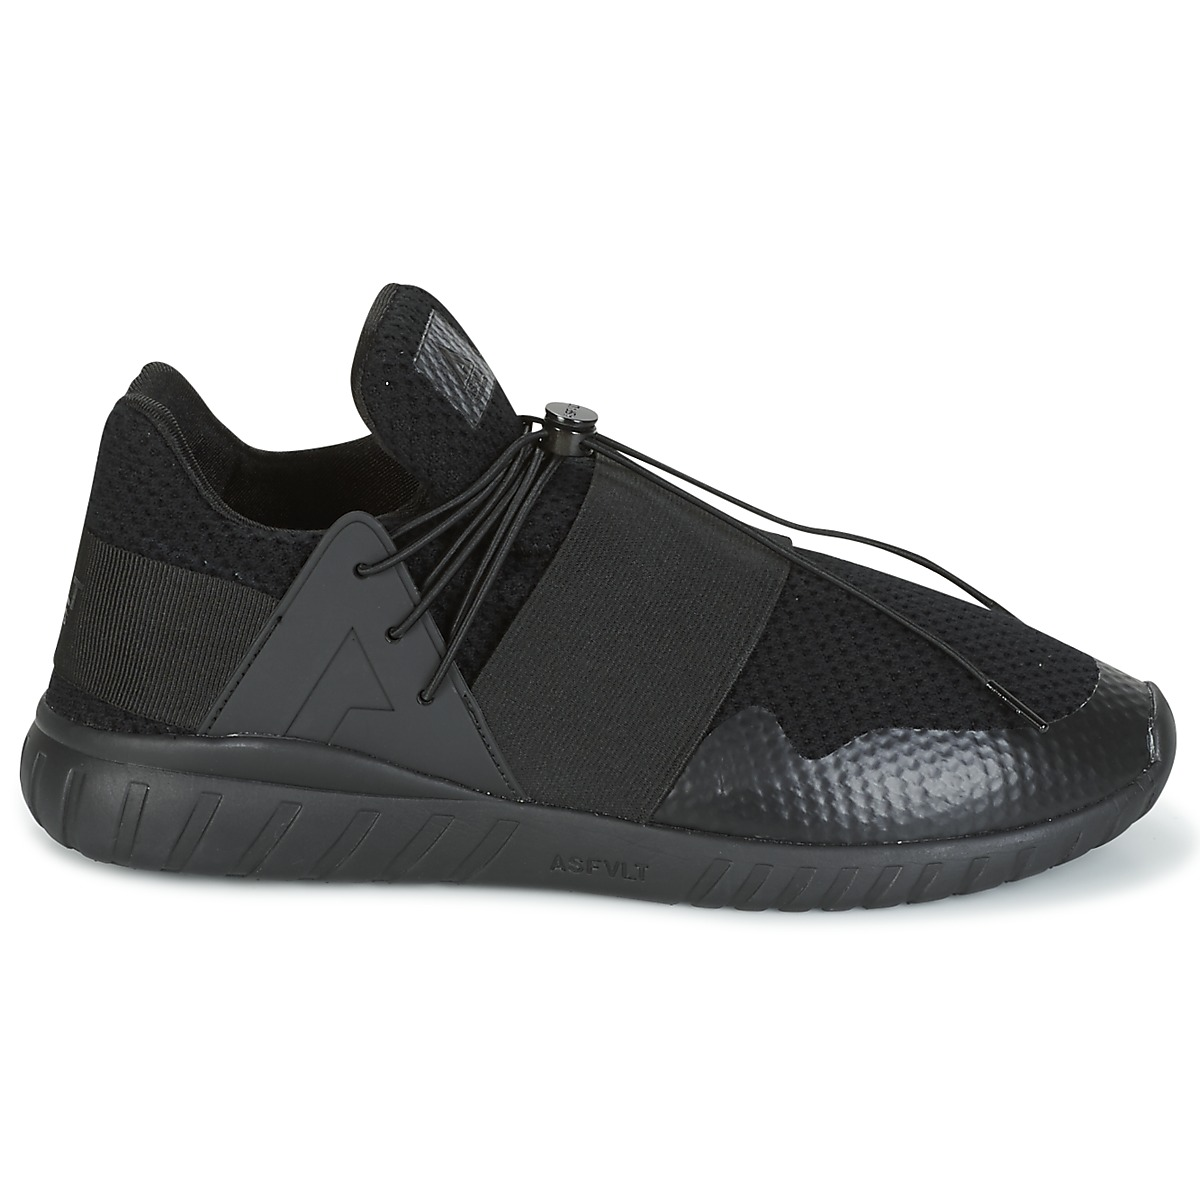 Asfvlt Asfvlt Asfvlt EVOLUTION MID Negro - Envío gratis Nueva promoción - Zapatos Deportivas bajas Hombre 0d9225